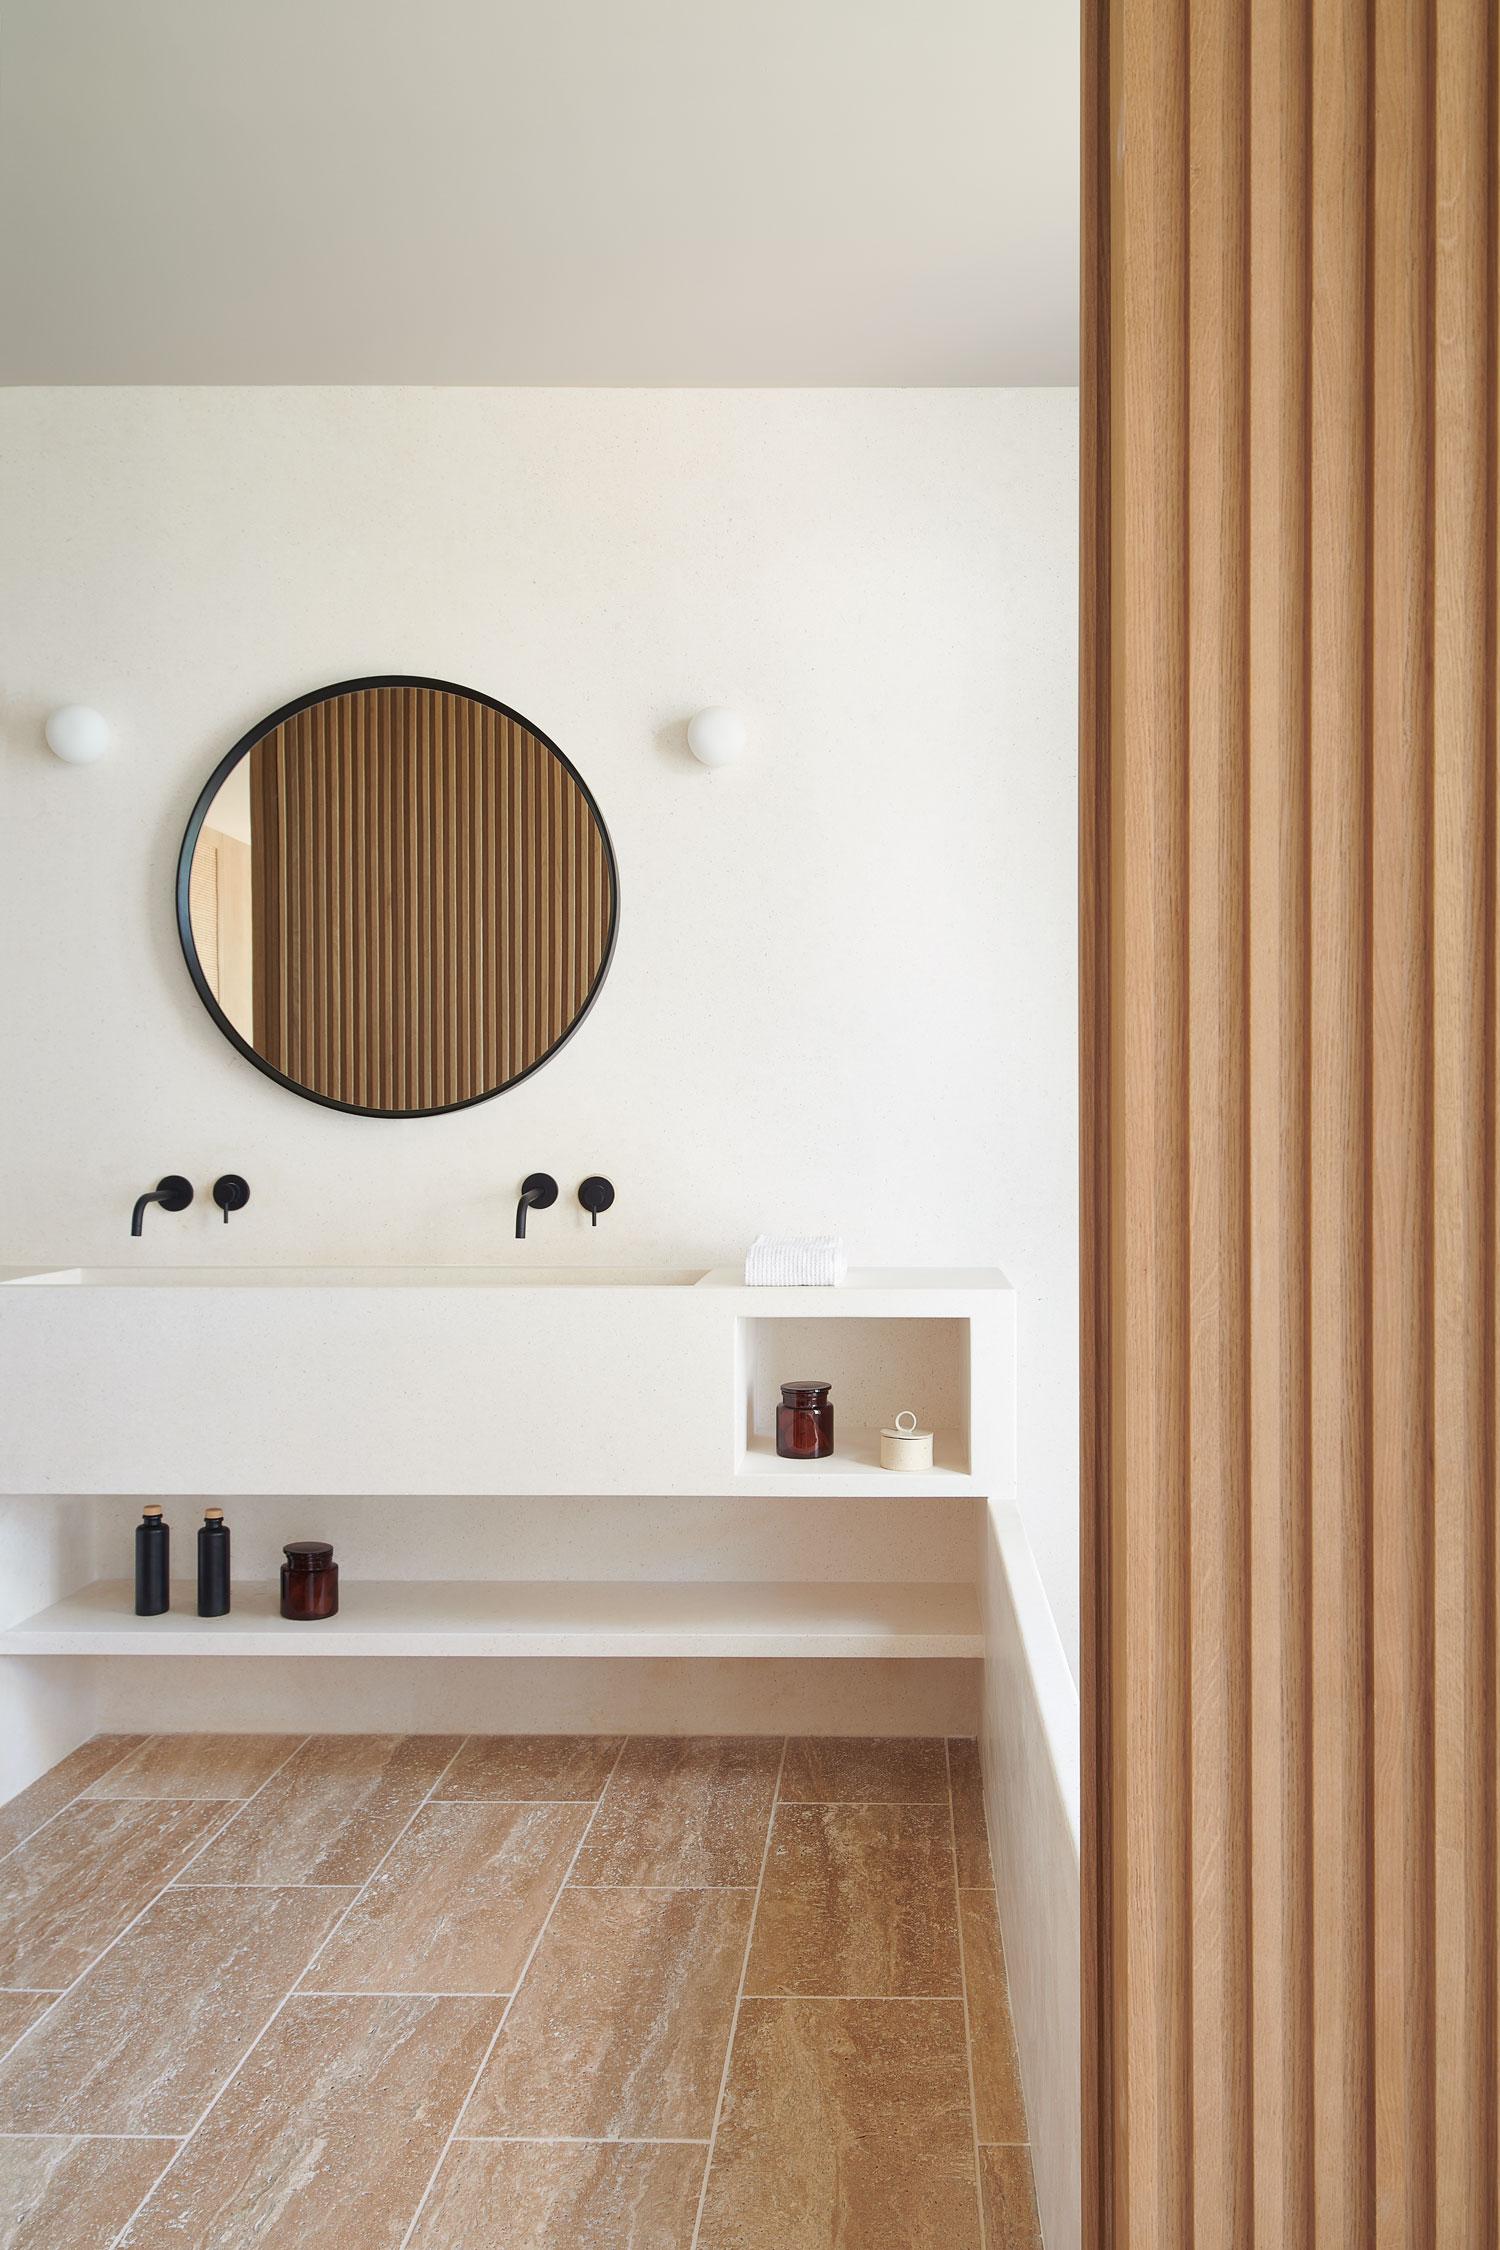 Lam Studio Hotel Maslina Hvar Croatia Luxury Accommodatino Photo Claire Israel Yellowtrace 15